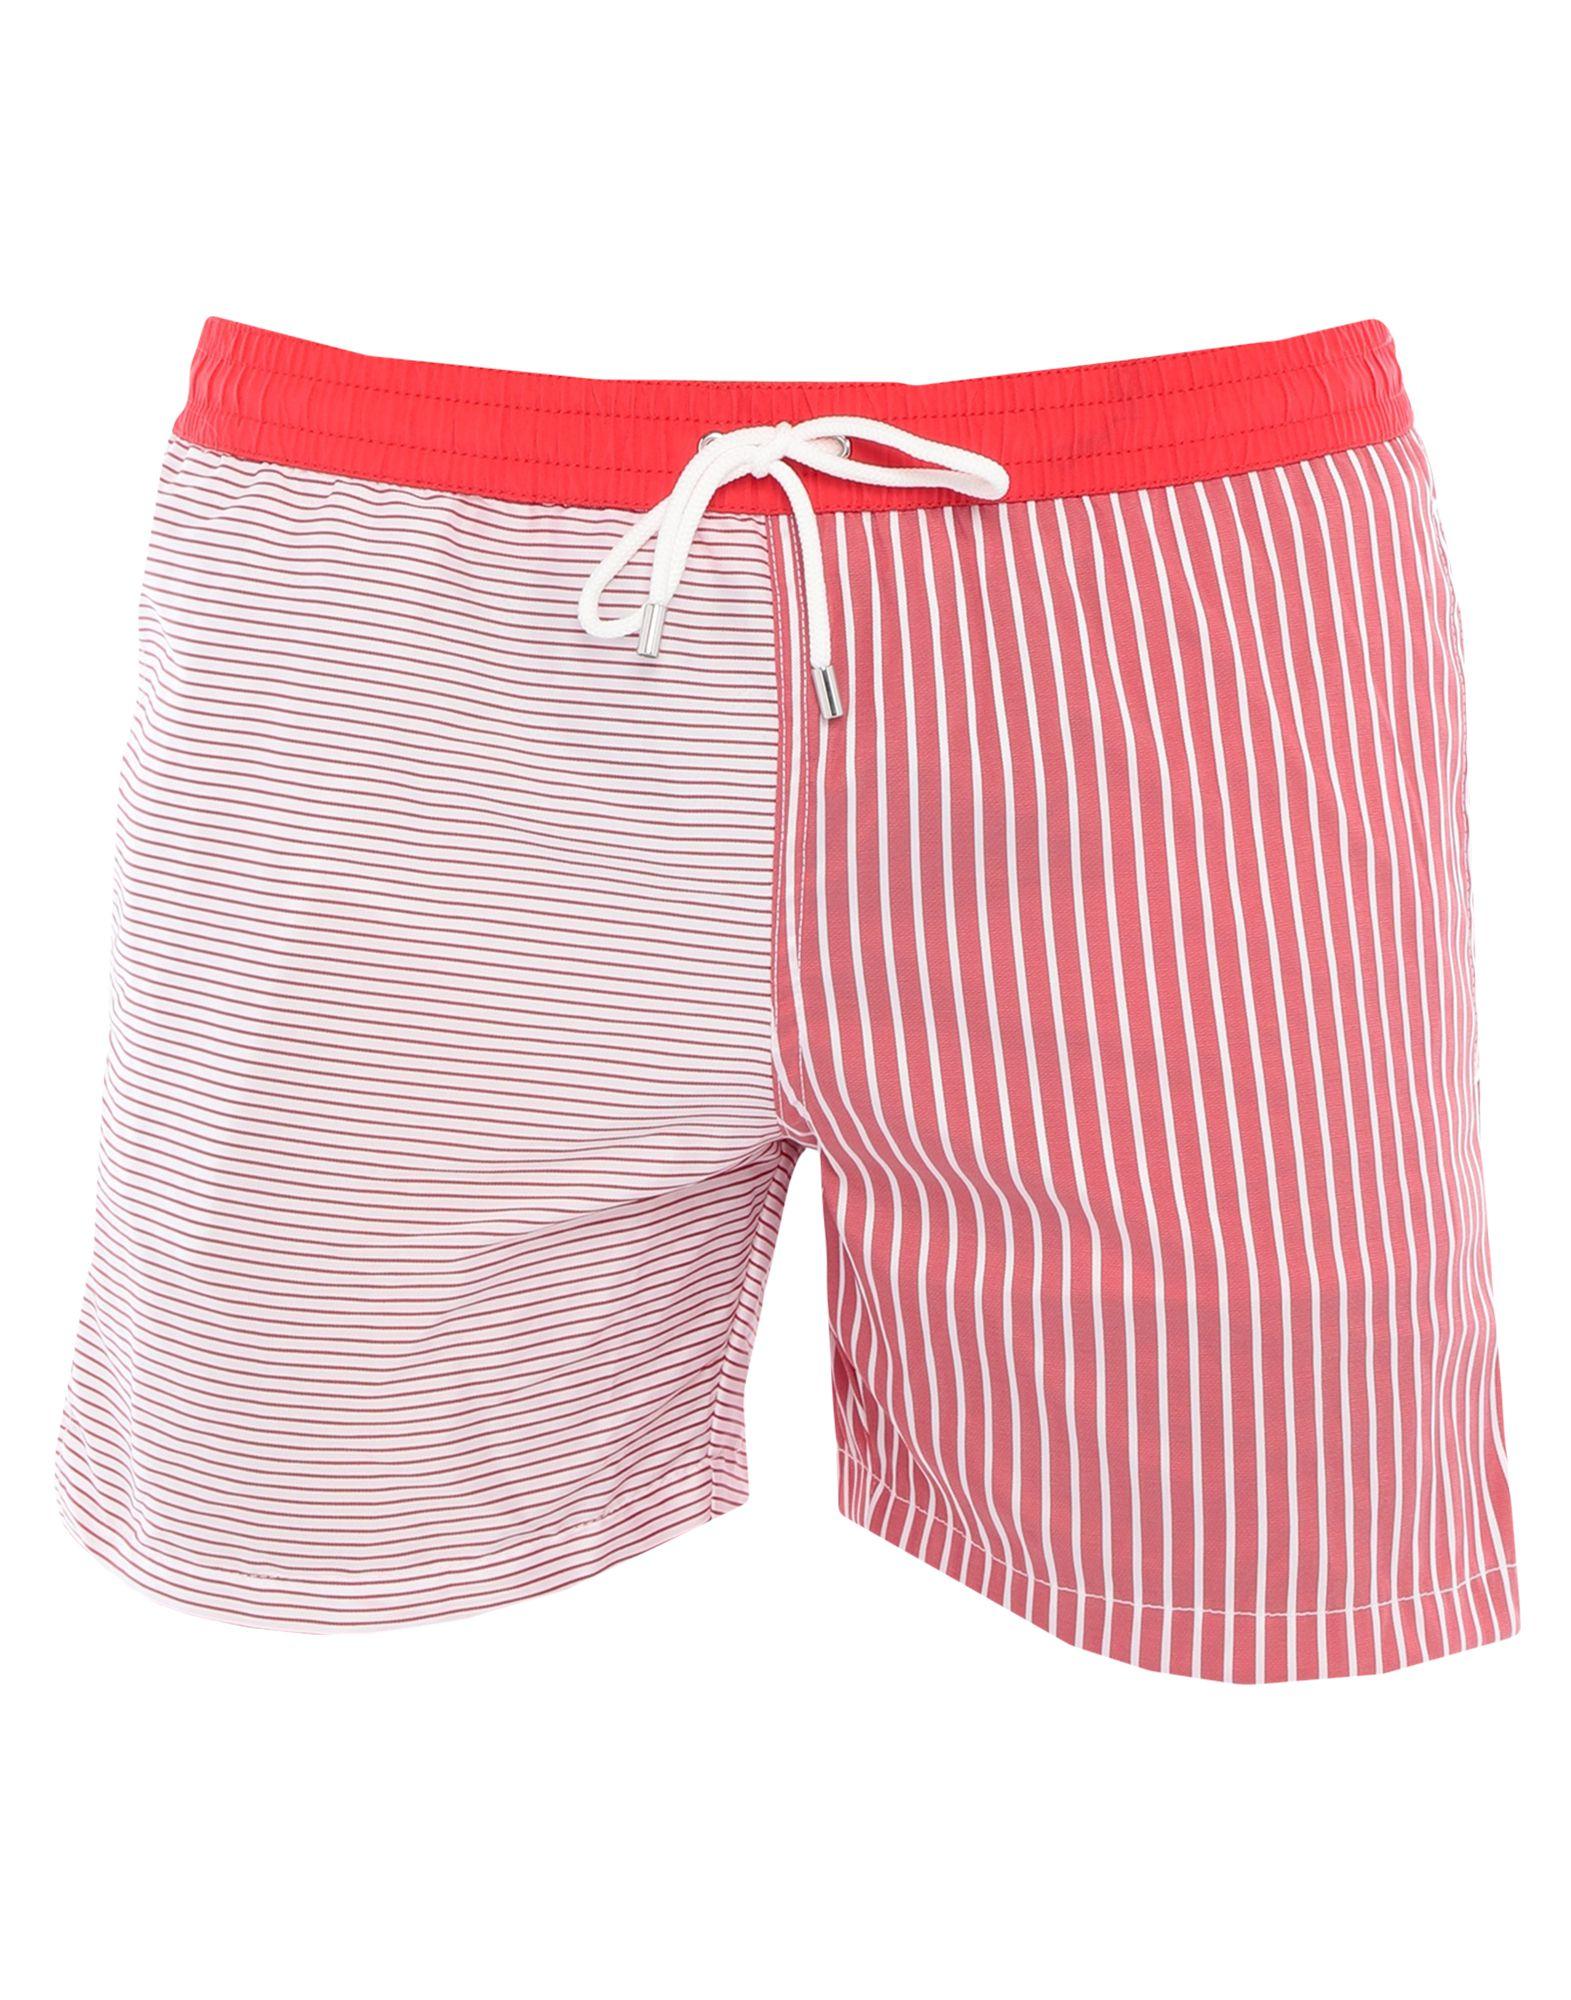 ELEVENTY Swim trunks. techno fabric, no appliqués, stripes, multipockets, drawstring closure, internal slip, stretch. 71% Polyester, 29% Elastane